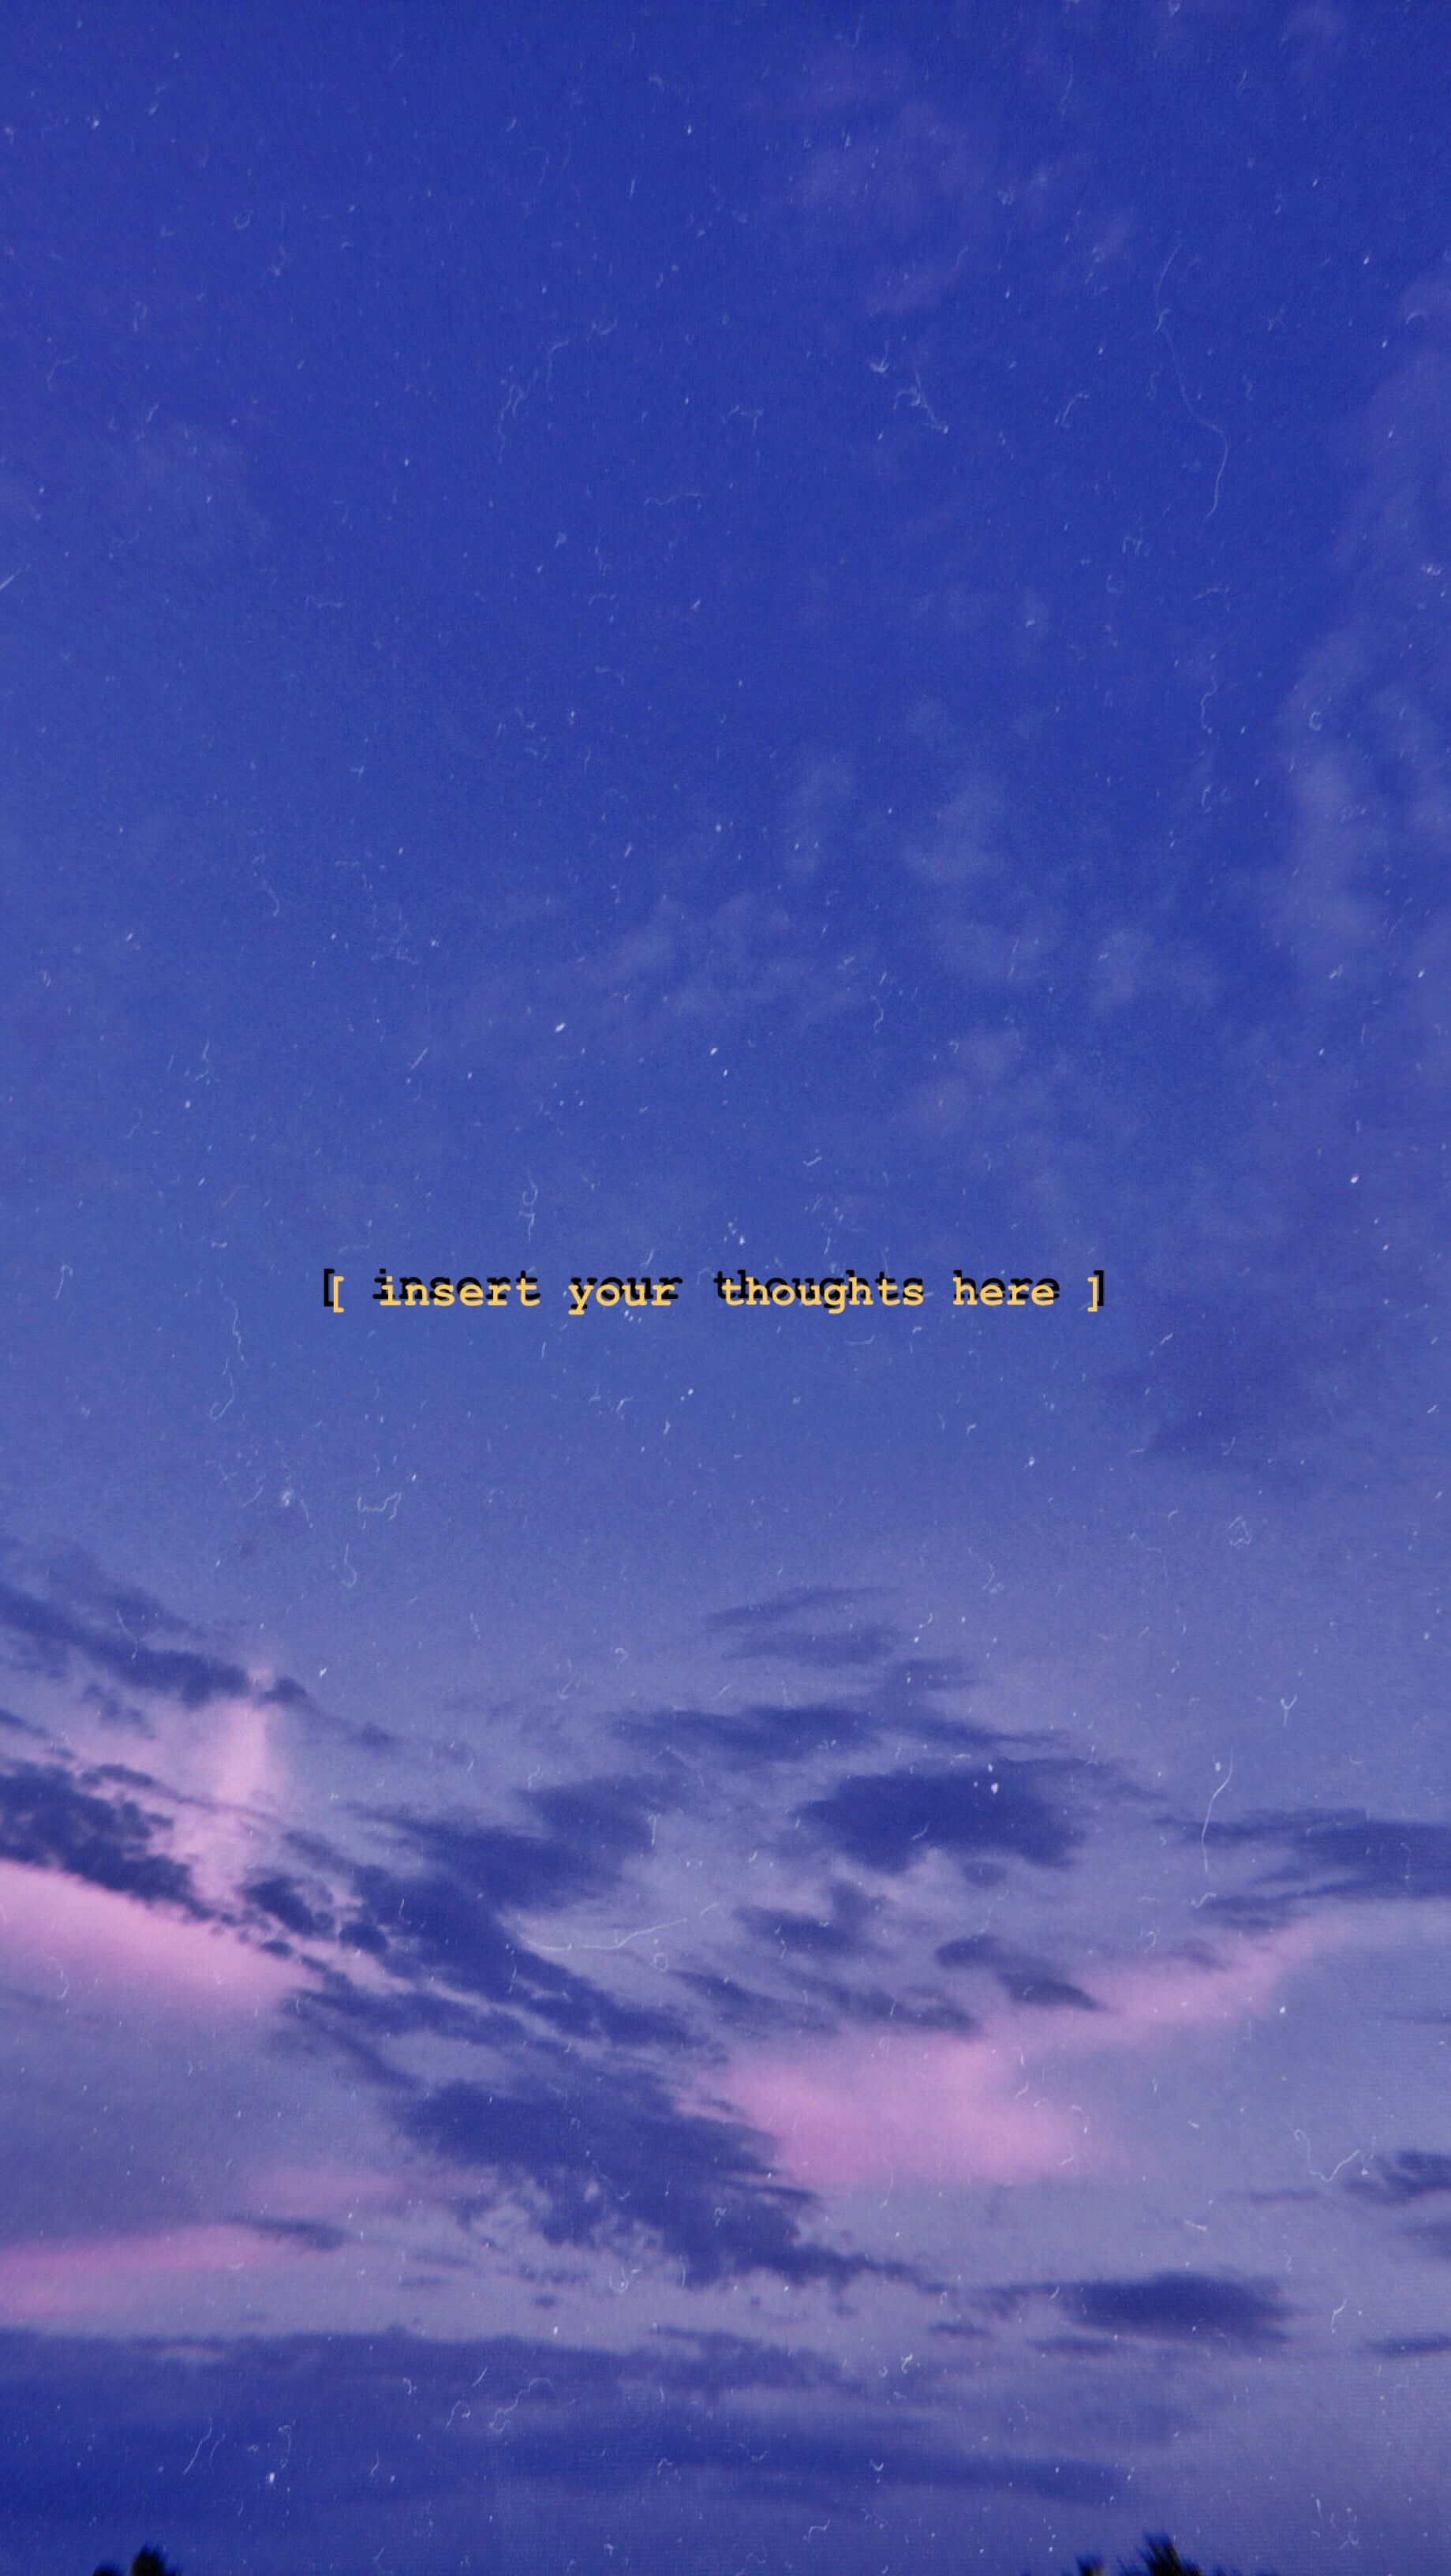 Sky Sunset Purple Text Imagine Wallpaper In 2019